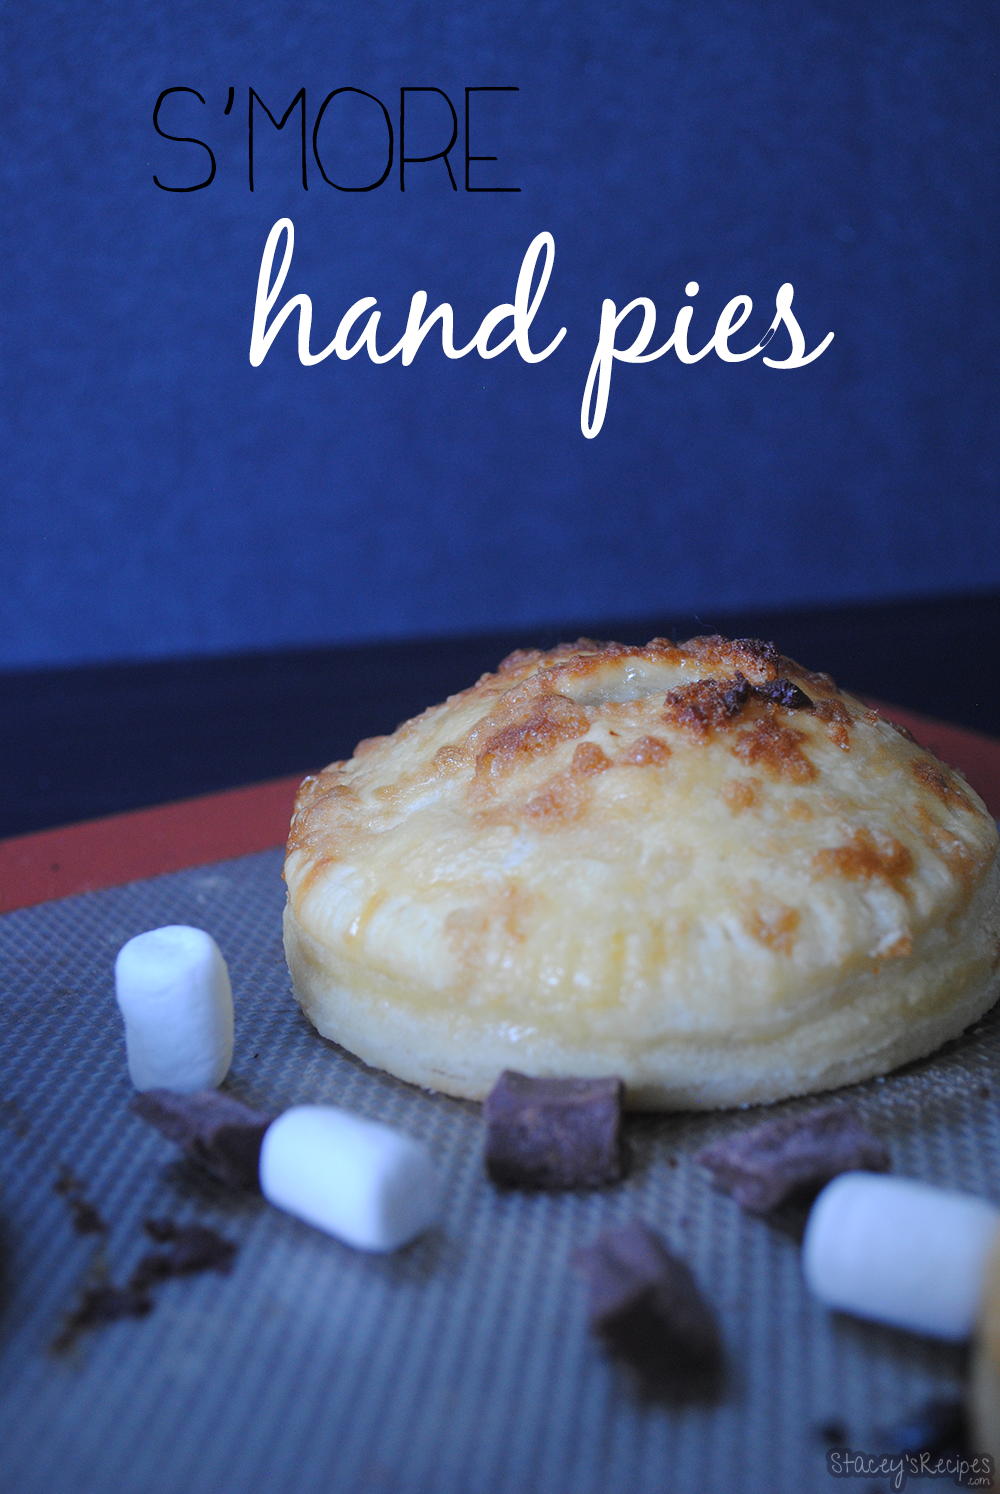 Smore Hand Pies (Gluten-Free Option)